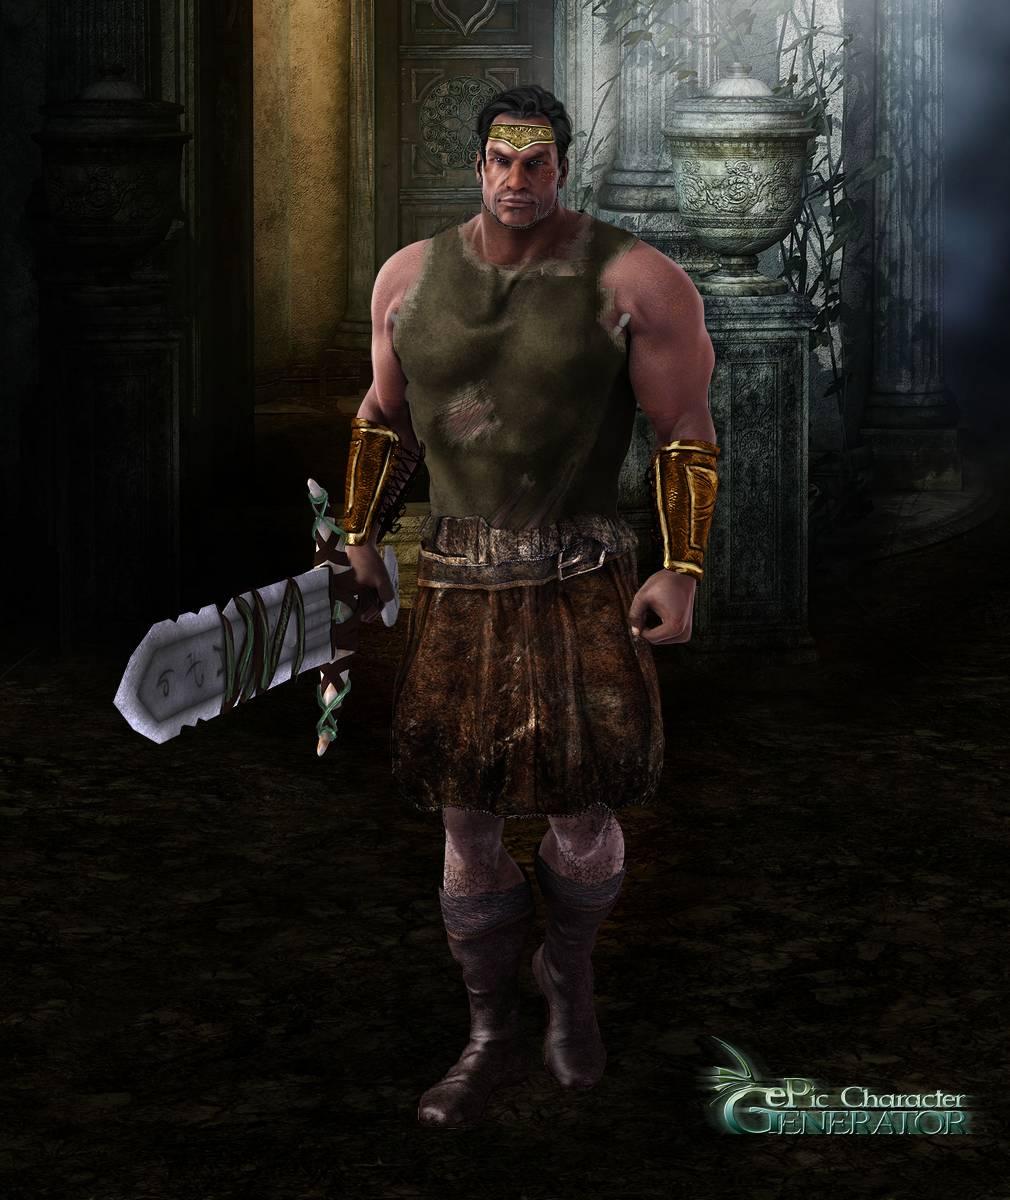 ePic Character Generator Season 2 Muscular Barbarian Screenshot 04